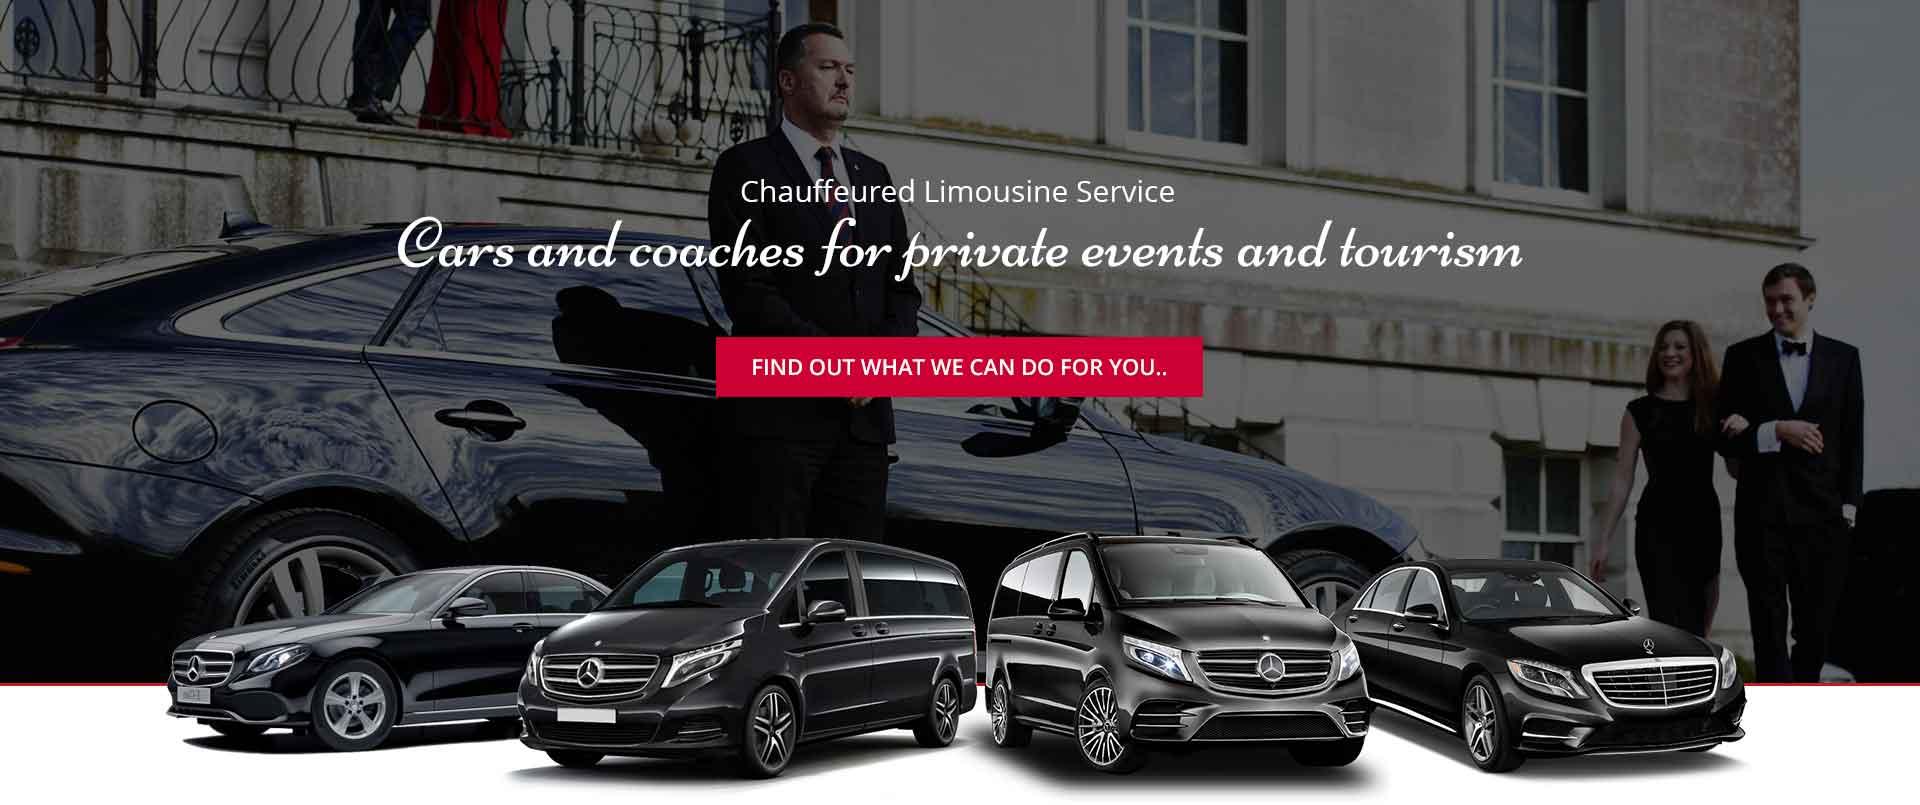 Chauffeured Limousine Service